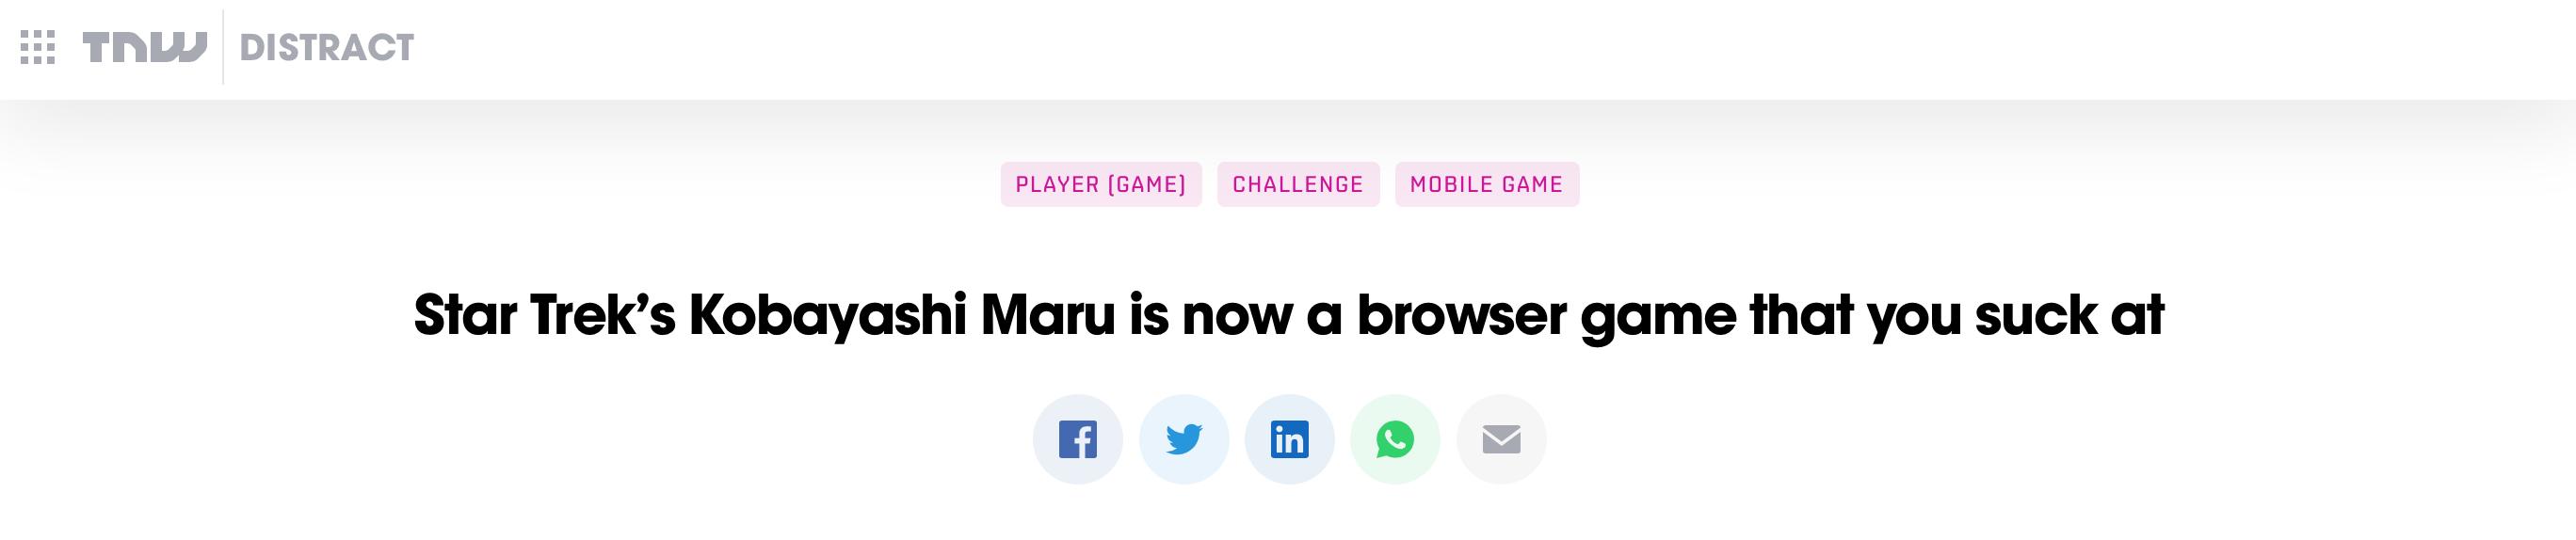 1 Headline